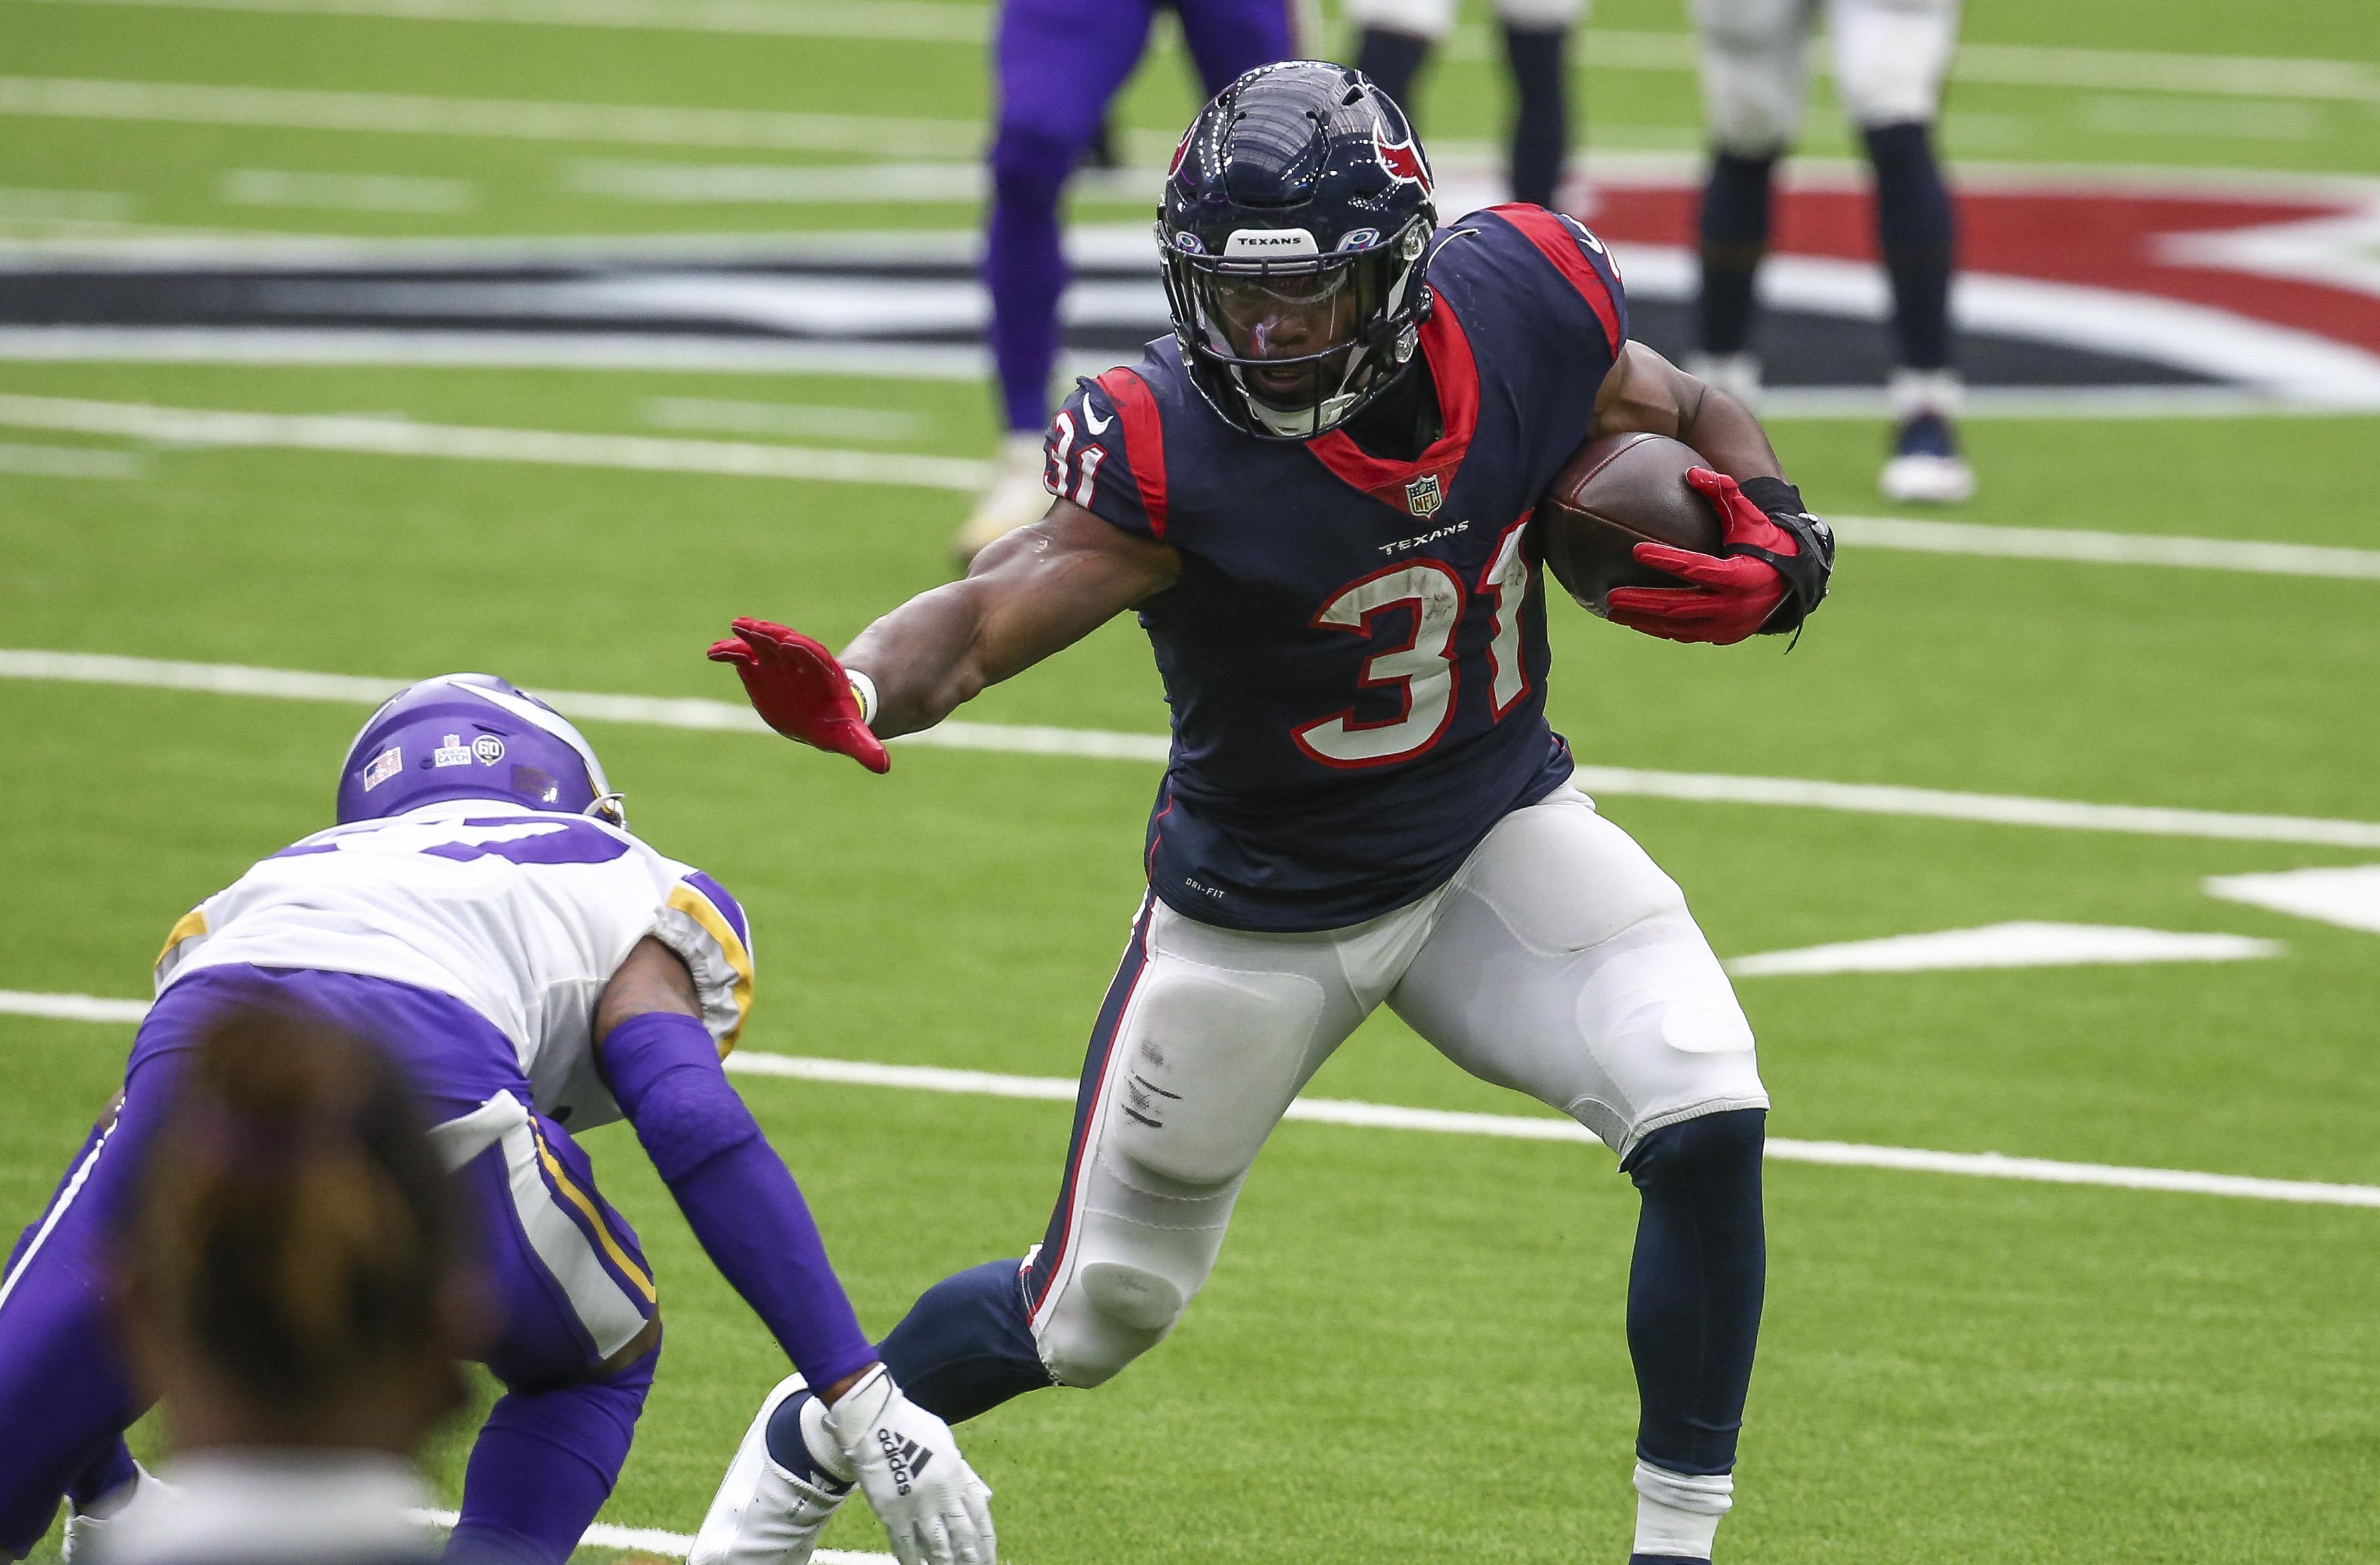 NFL: Minnesota Vikings at Houston Texans